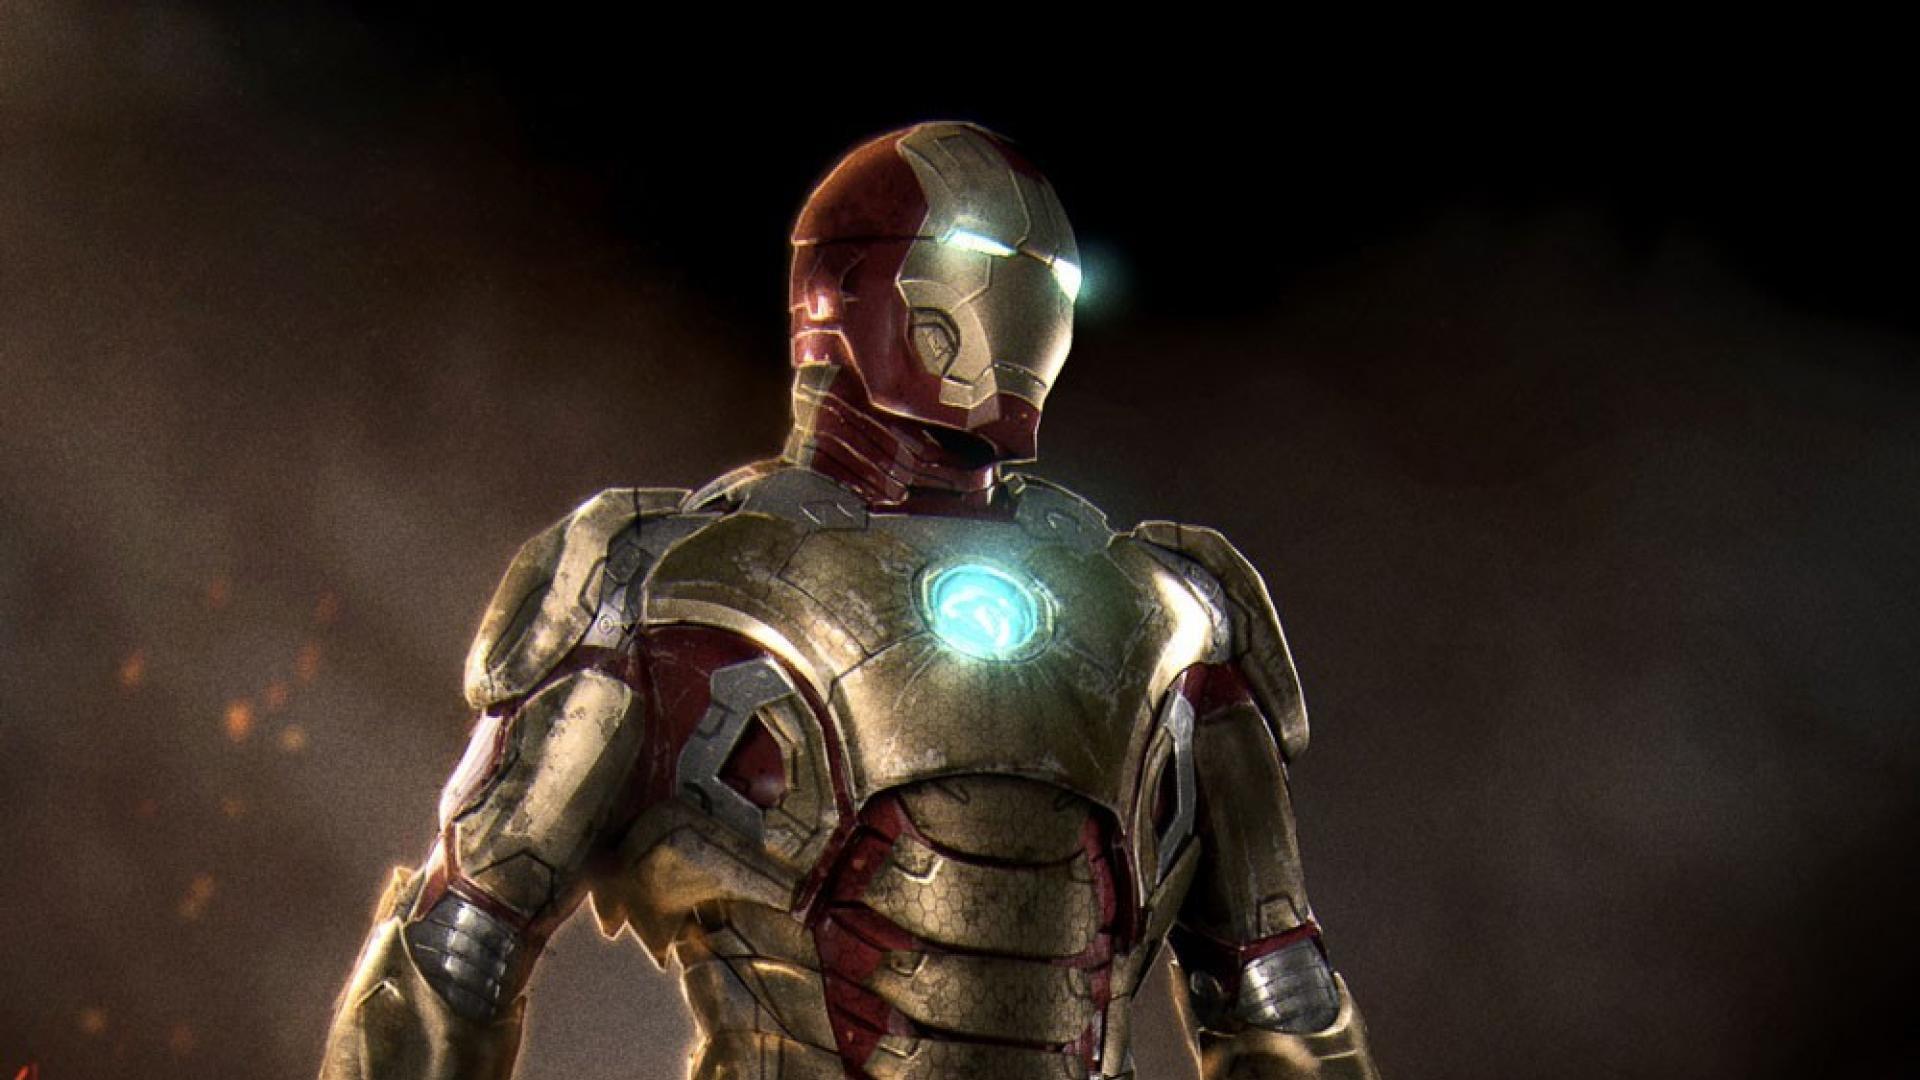 Iron Man Wallpaper 34447: Iron Man Mark 42 Wallpapers